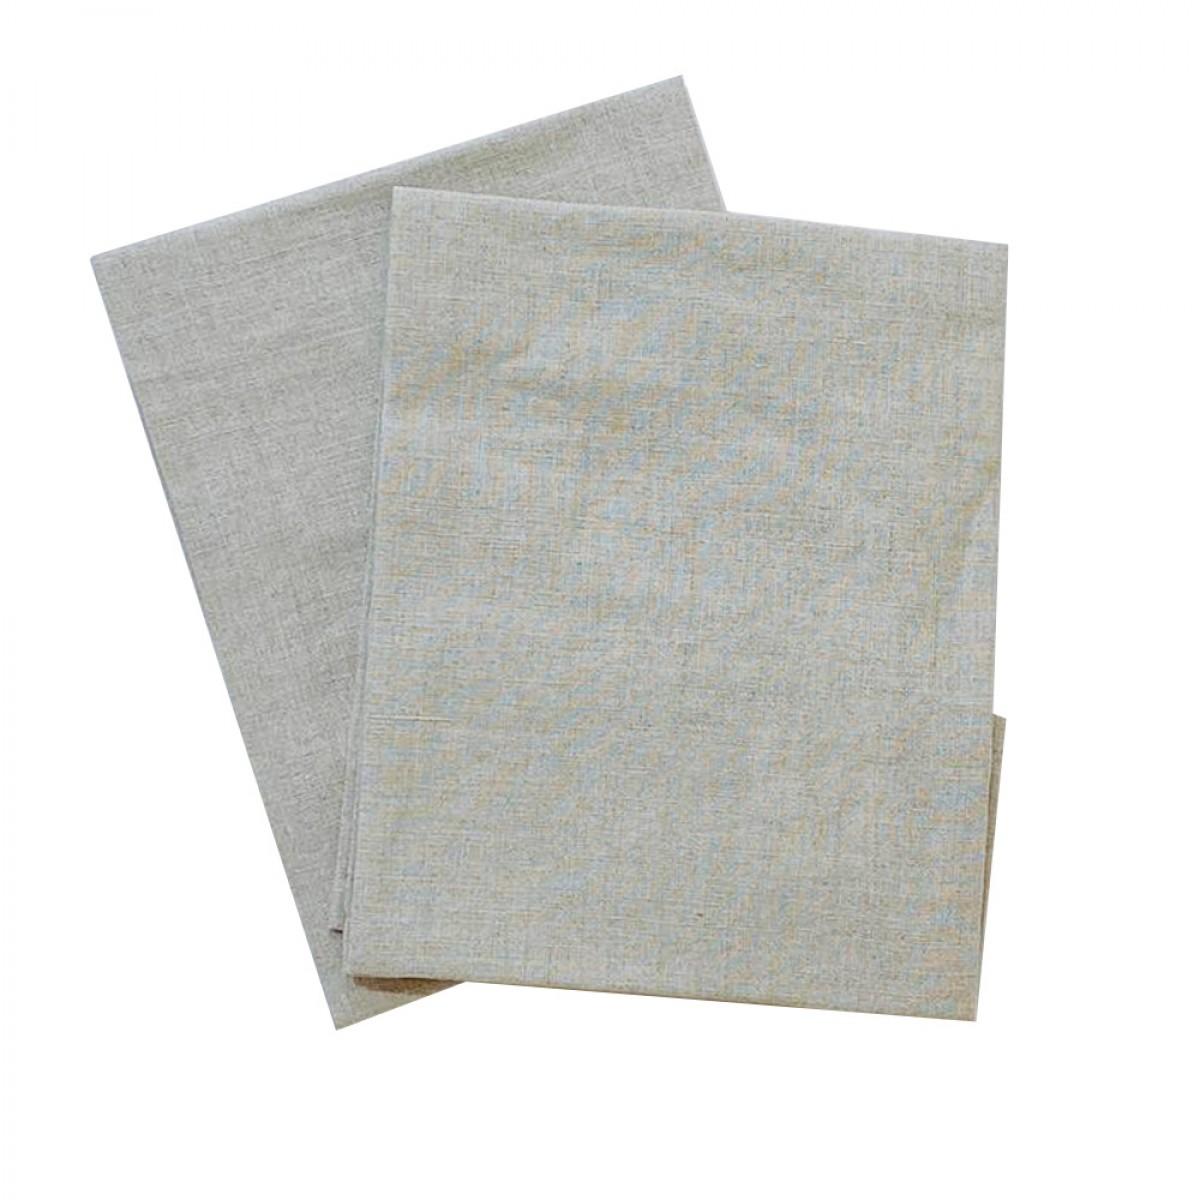 Linen Napkin - Smoke Grey (Set of 6)